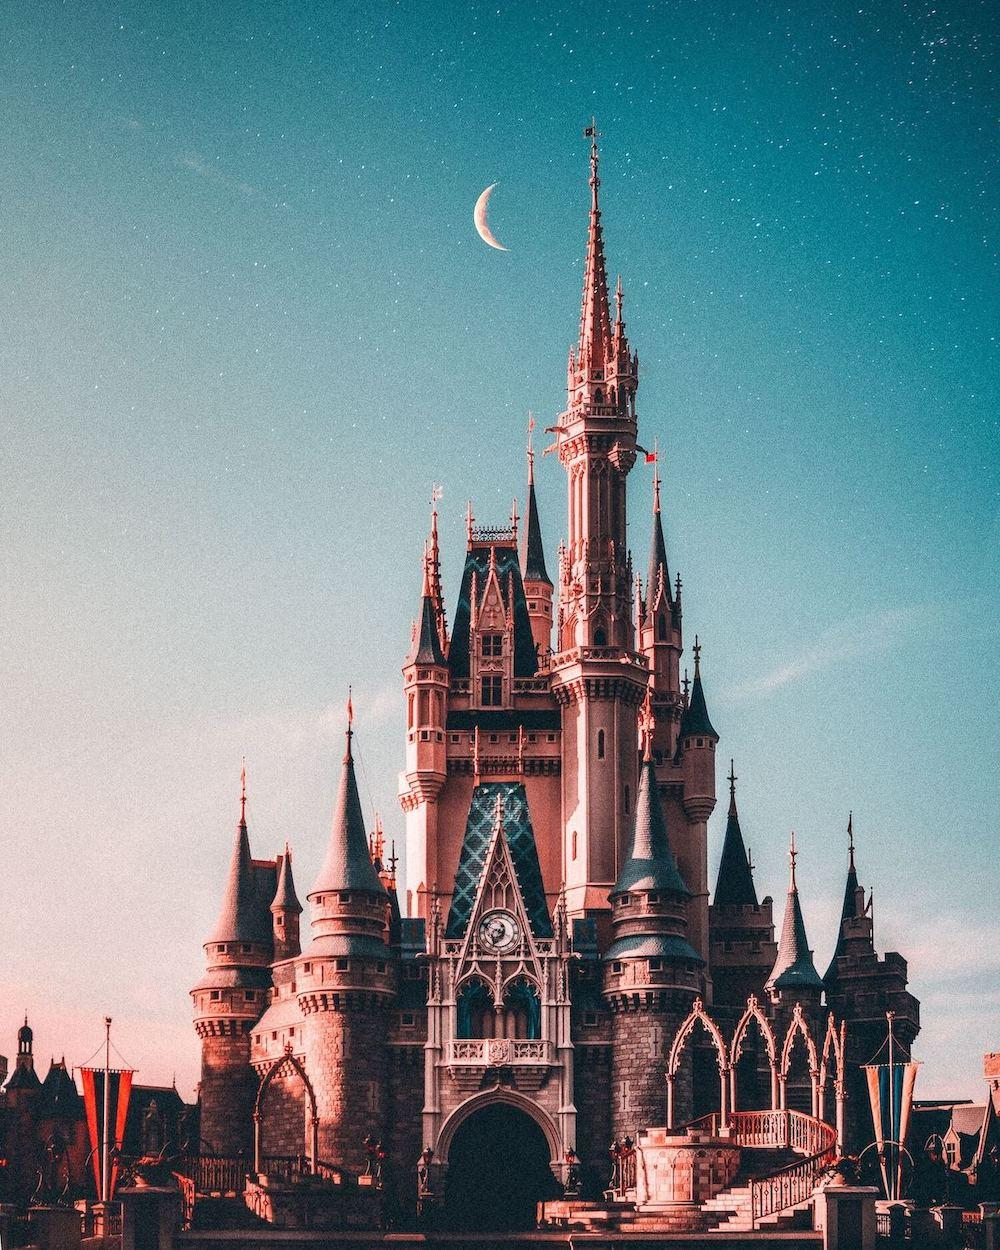 Disney World castle under the stars